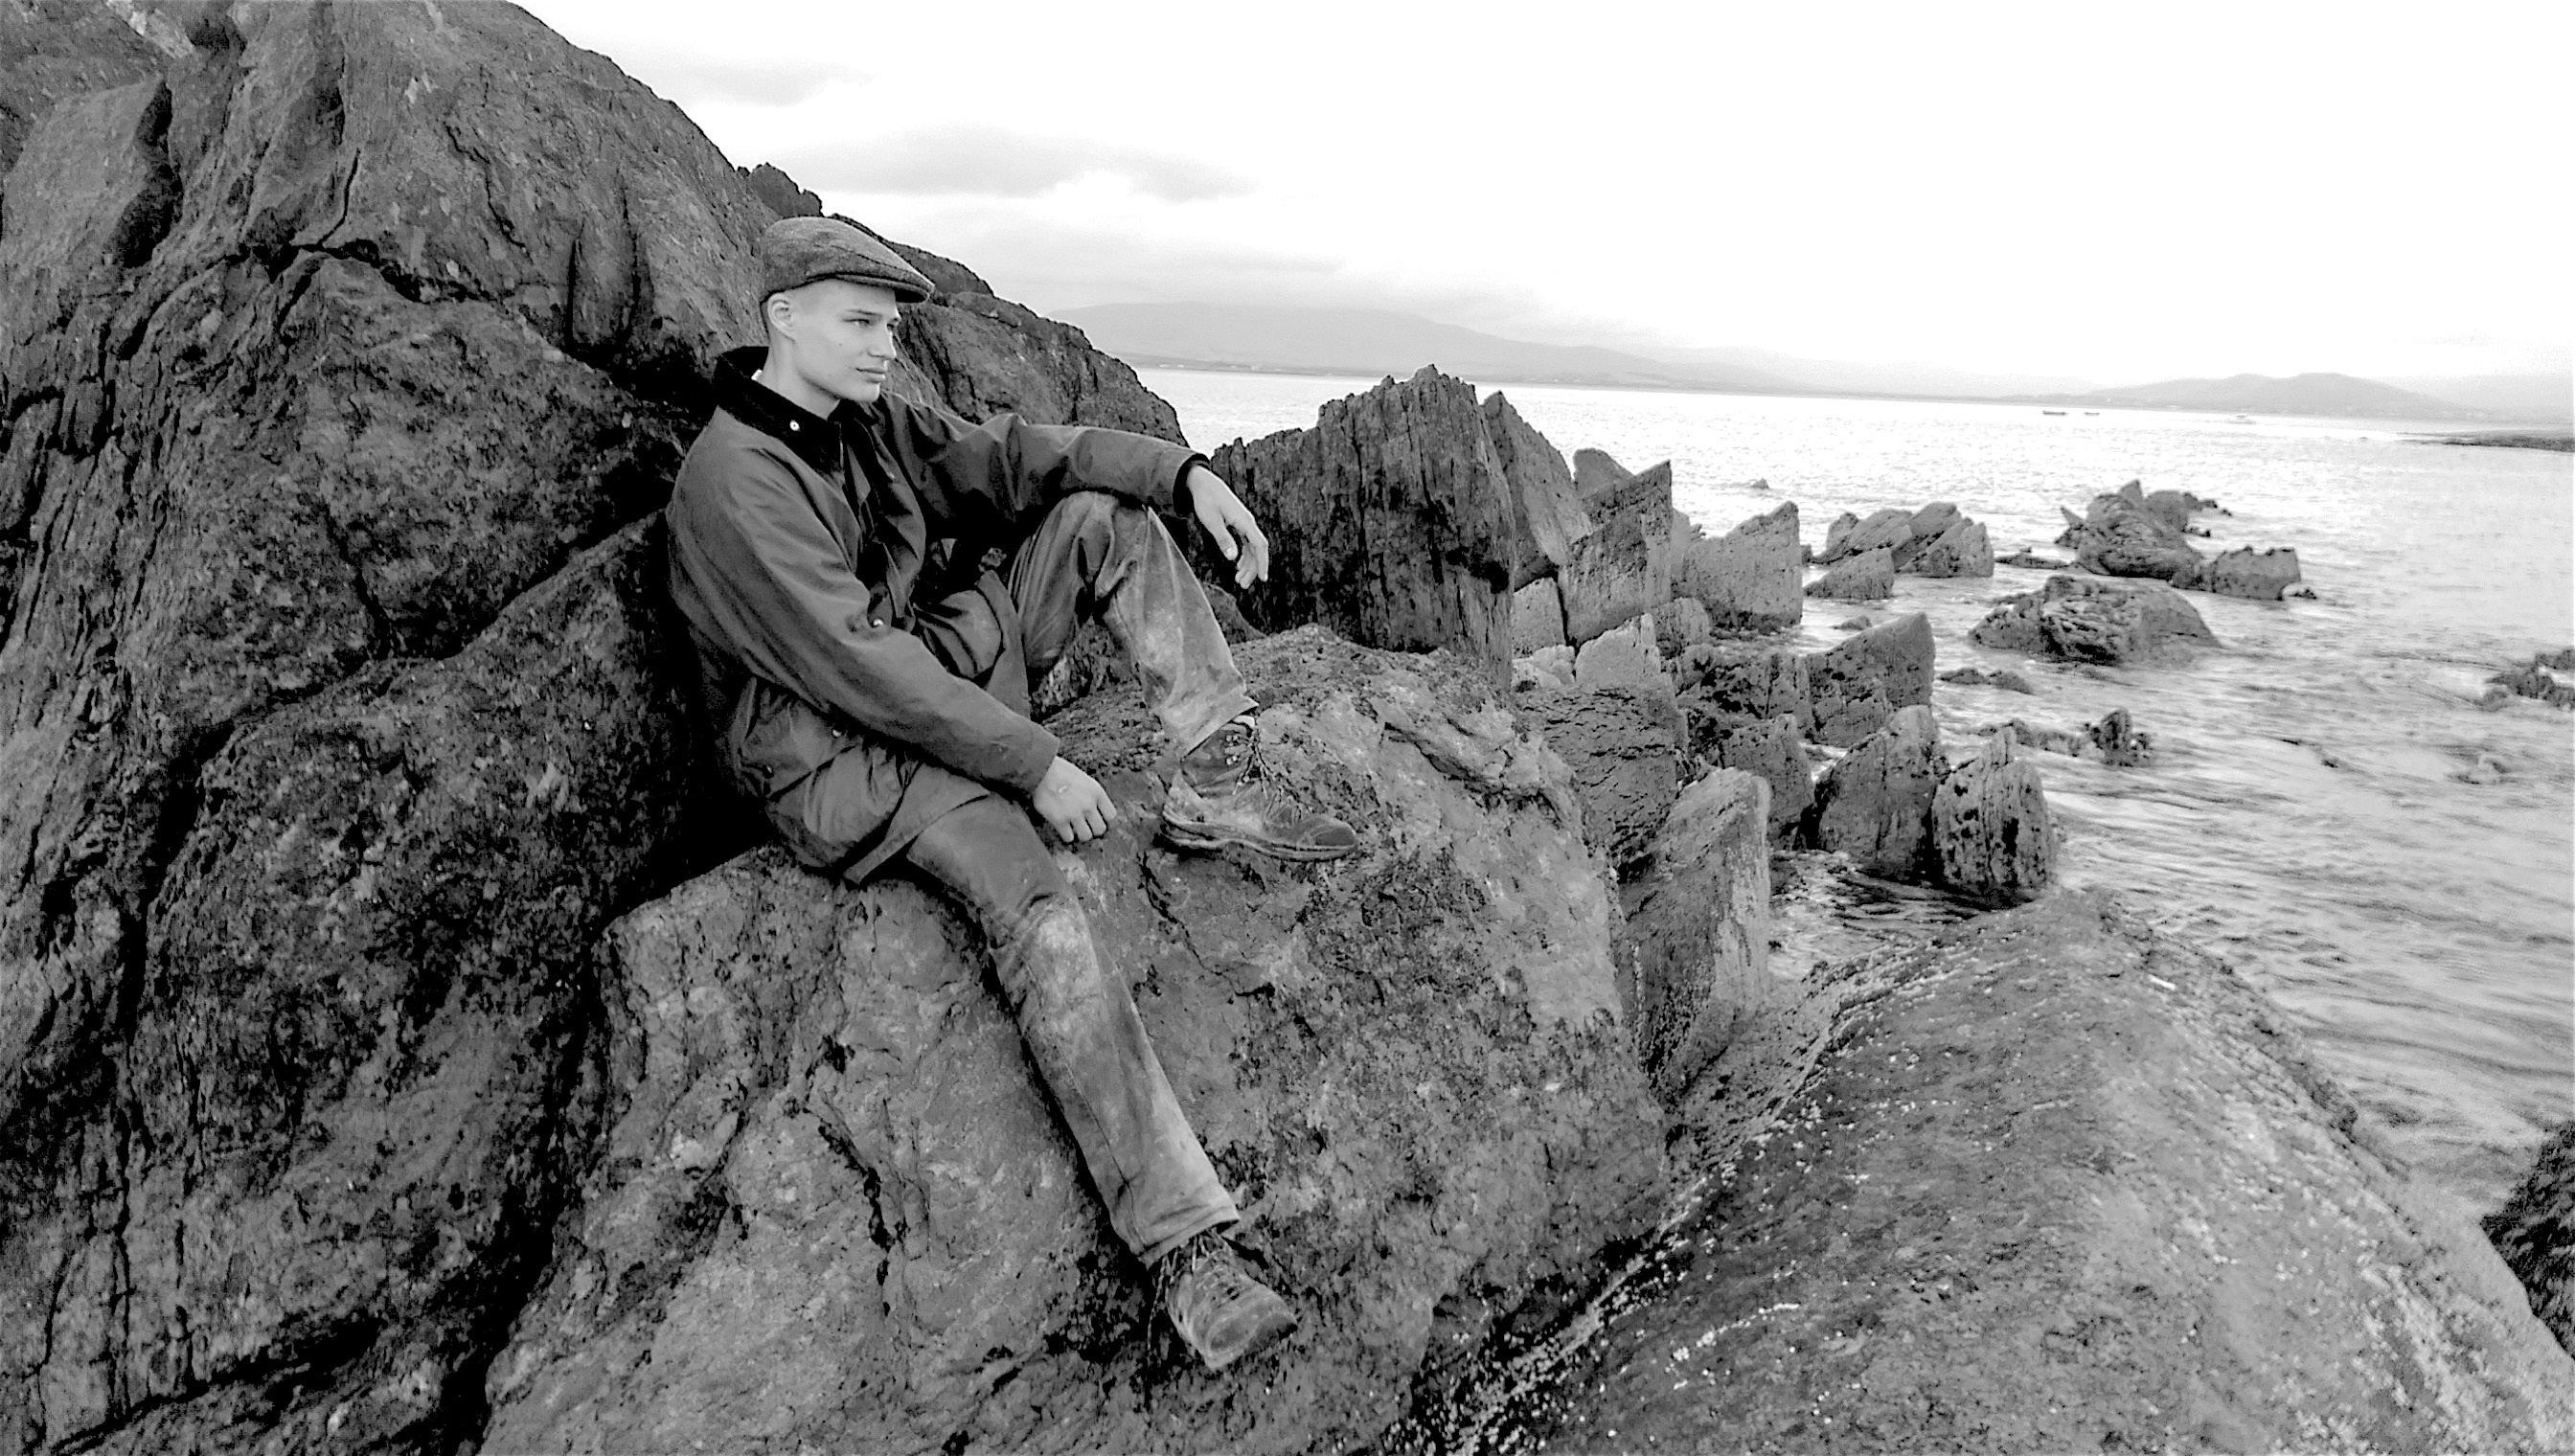 Junger Mann auf Felsen